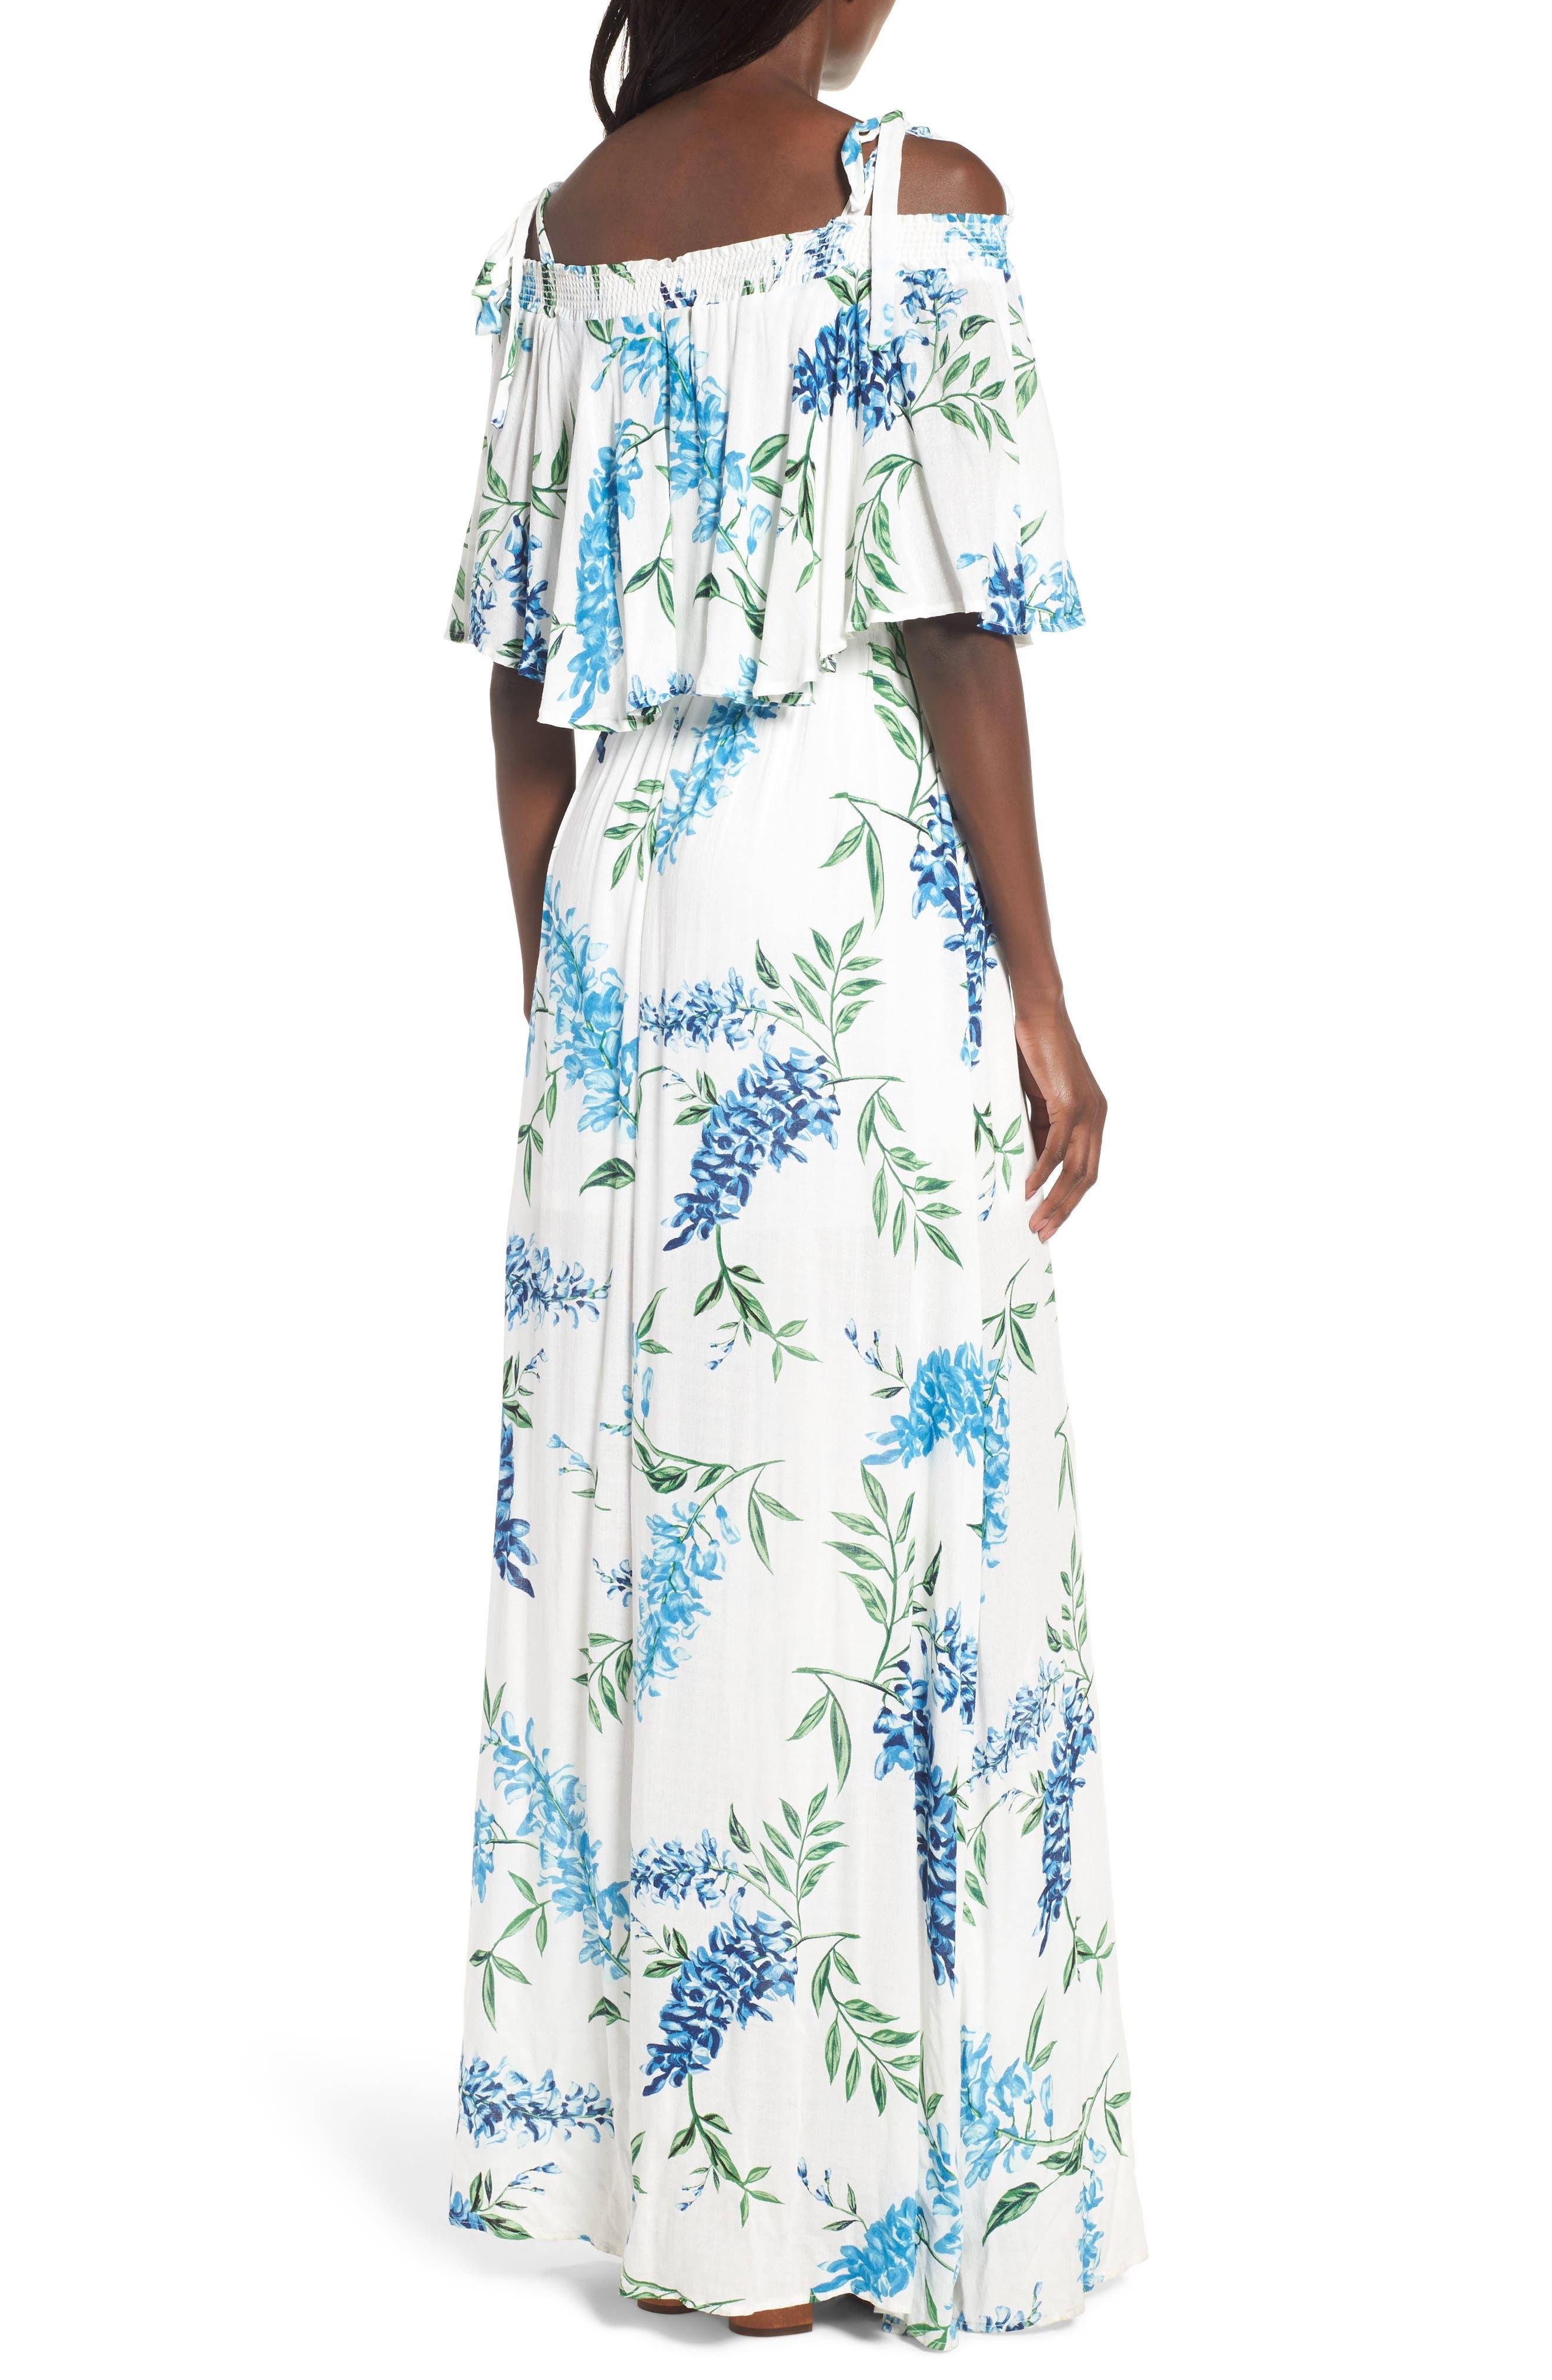 Nicola Ruffle Maxi Dress,                             Alternate thumbnail 2, color,                             Wisteria Wonder Challis